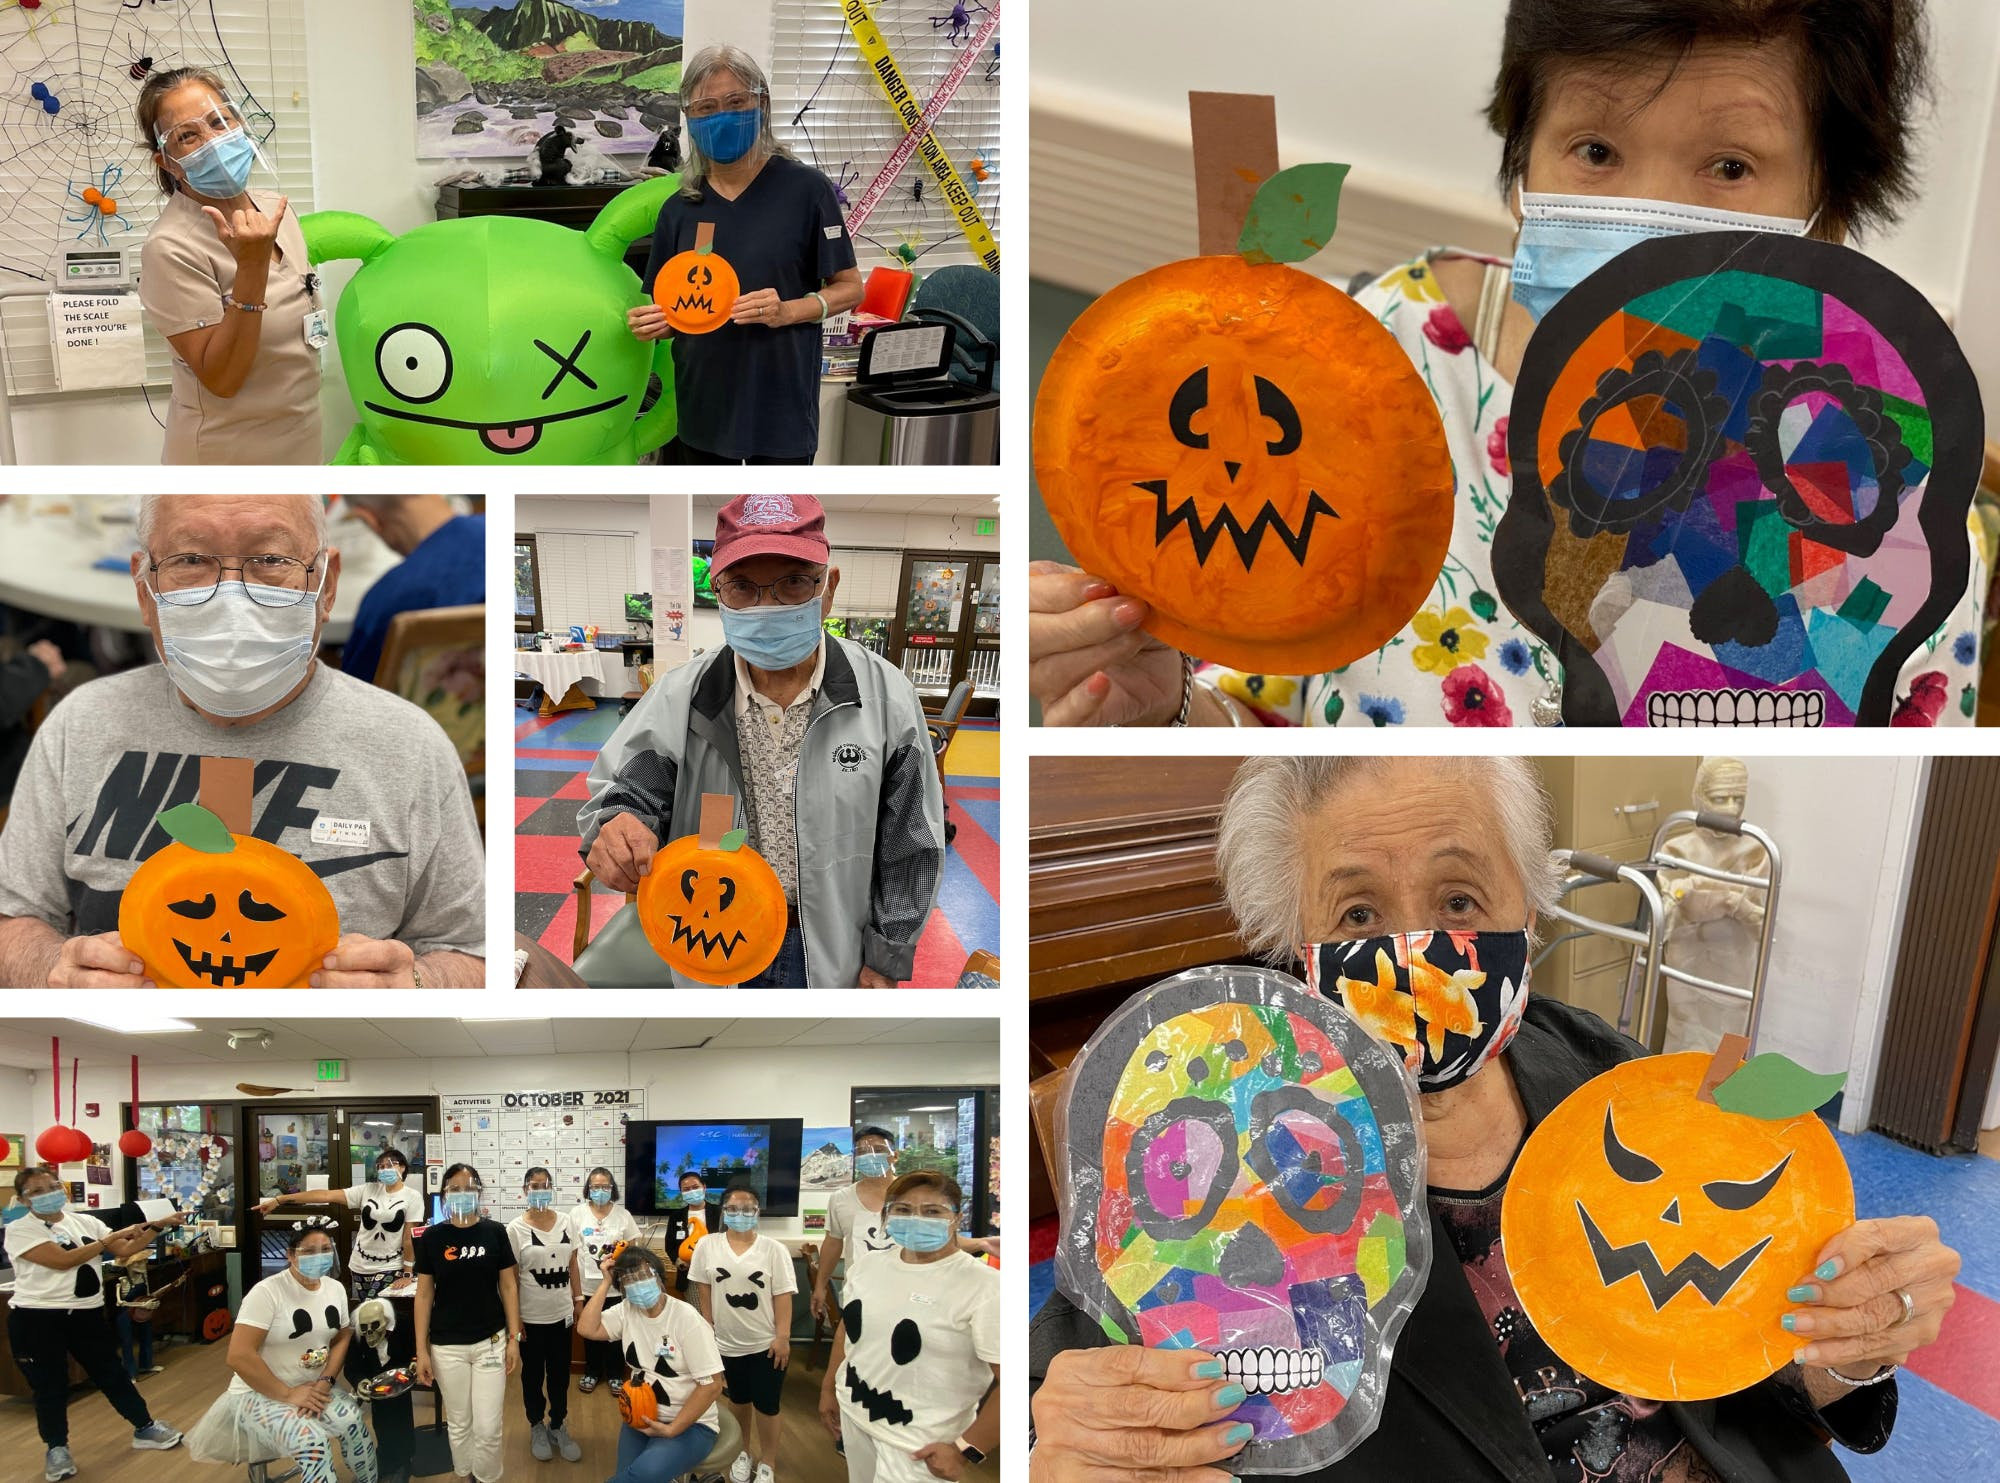 https://images.prismic.io/arcadia-website/3e5b1c71-85bc-427c-85ee-c9a82b6f00f2_CUC+Halloween.png?auto=compress,format